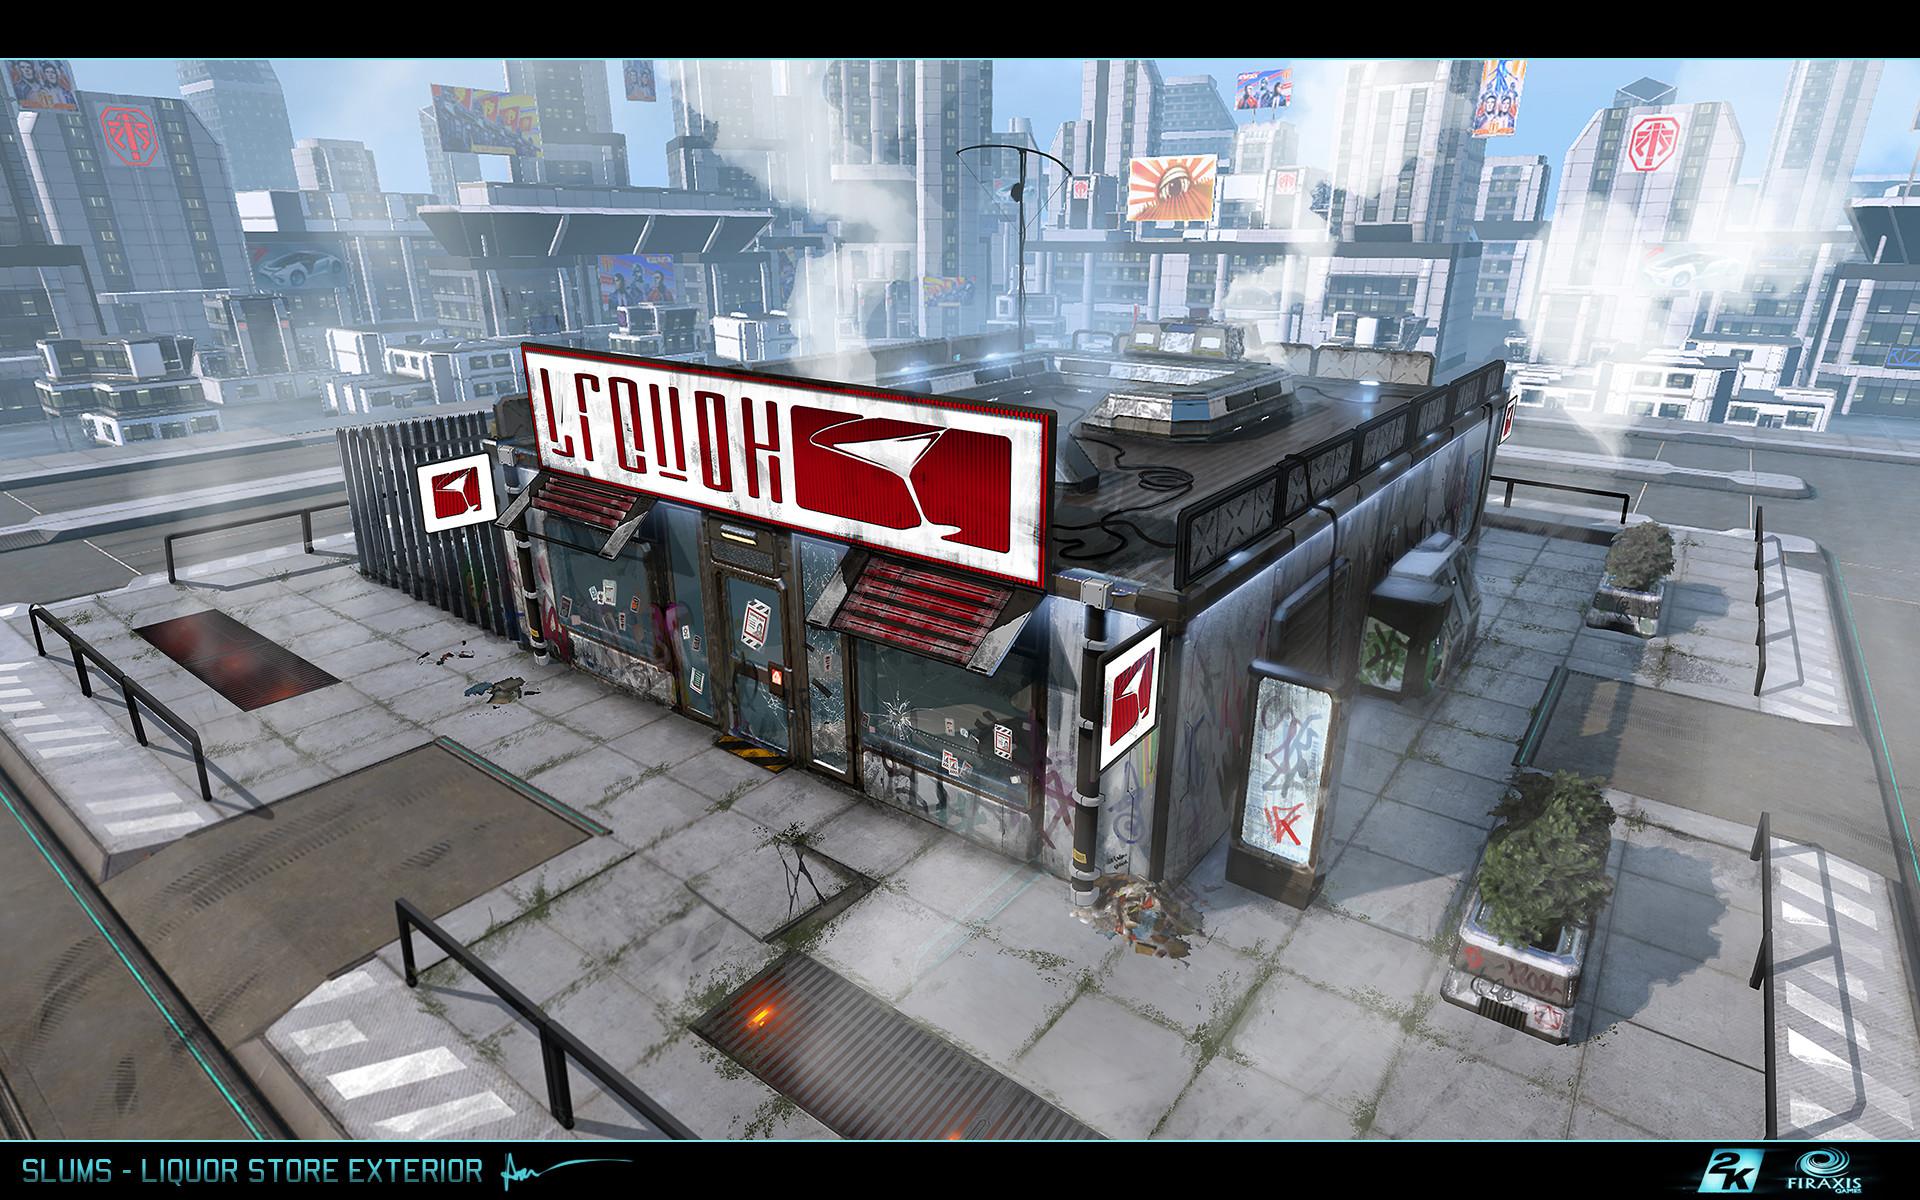 Samuel aaron whitehead slums liquor store exterior